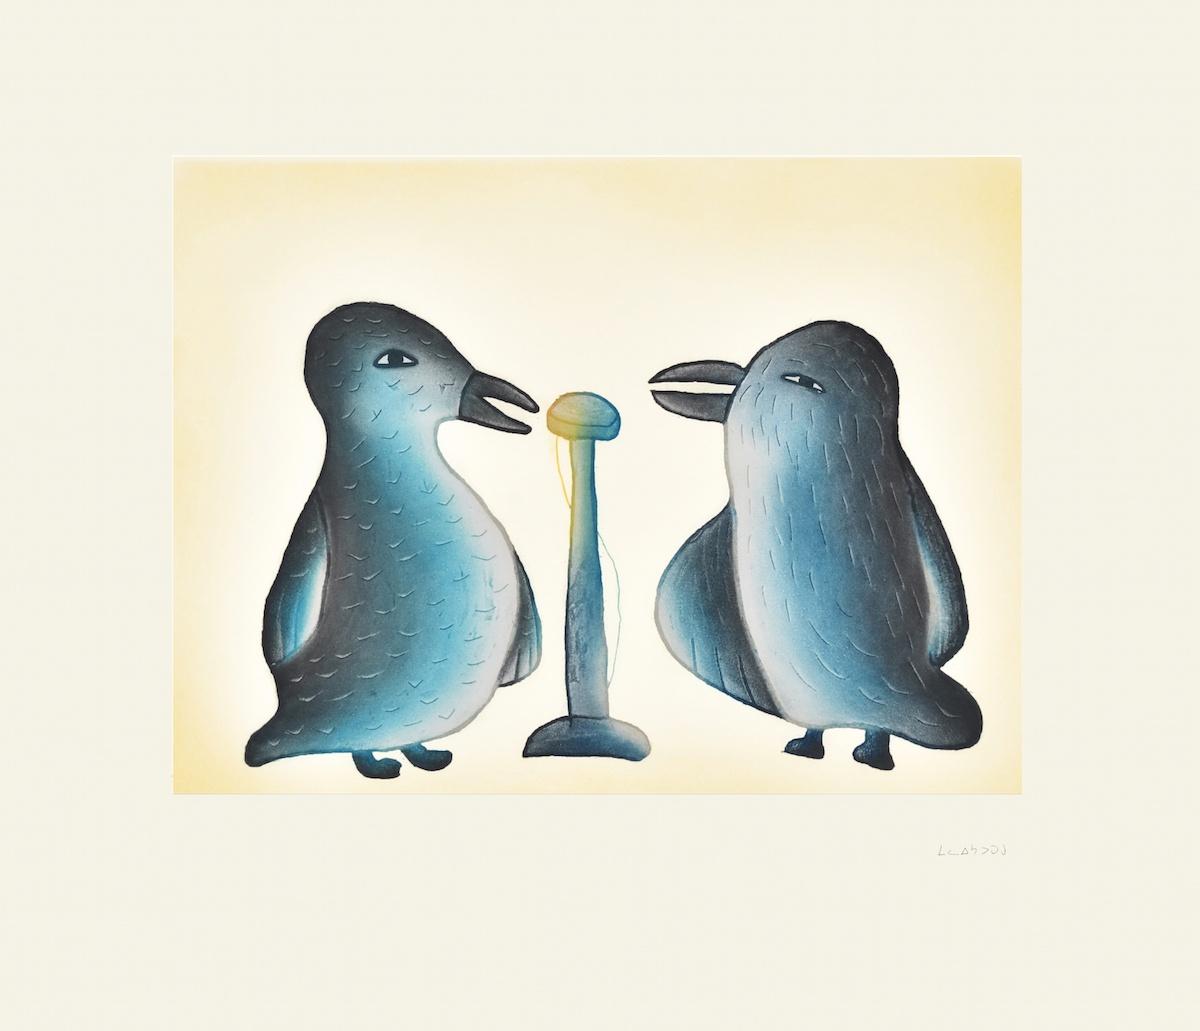 SONG BIRDS Cape Dorset Print Collection 2015 MALAIJA POOTOOGOOK Medium: Etching & Aquatint Paper: Arches White Printer: Studio PM Size: 21 ½ x 24 ¾ inches (54.5 x 63 cm) Price: $700